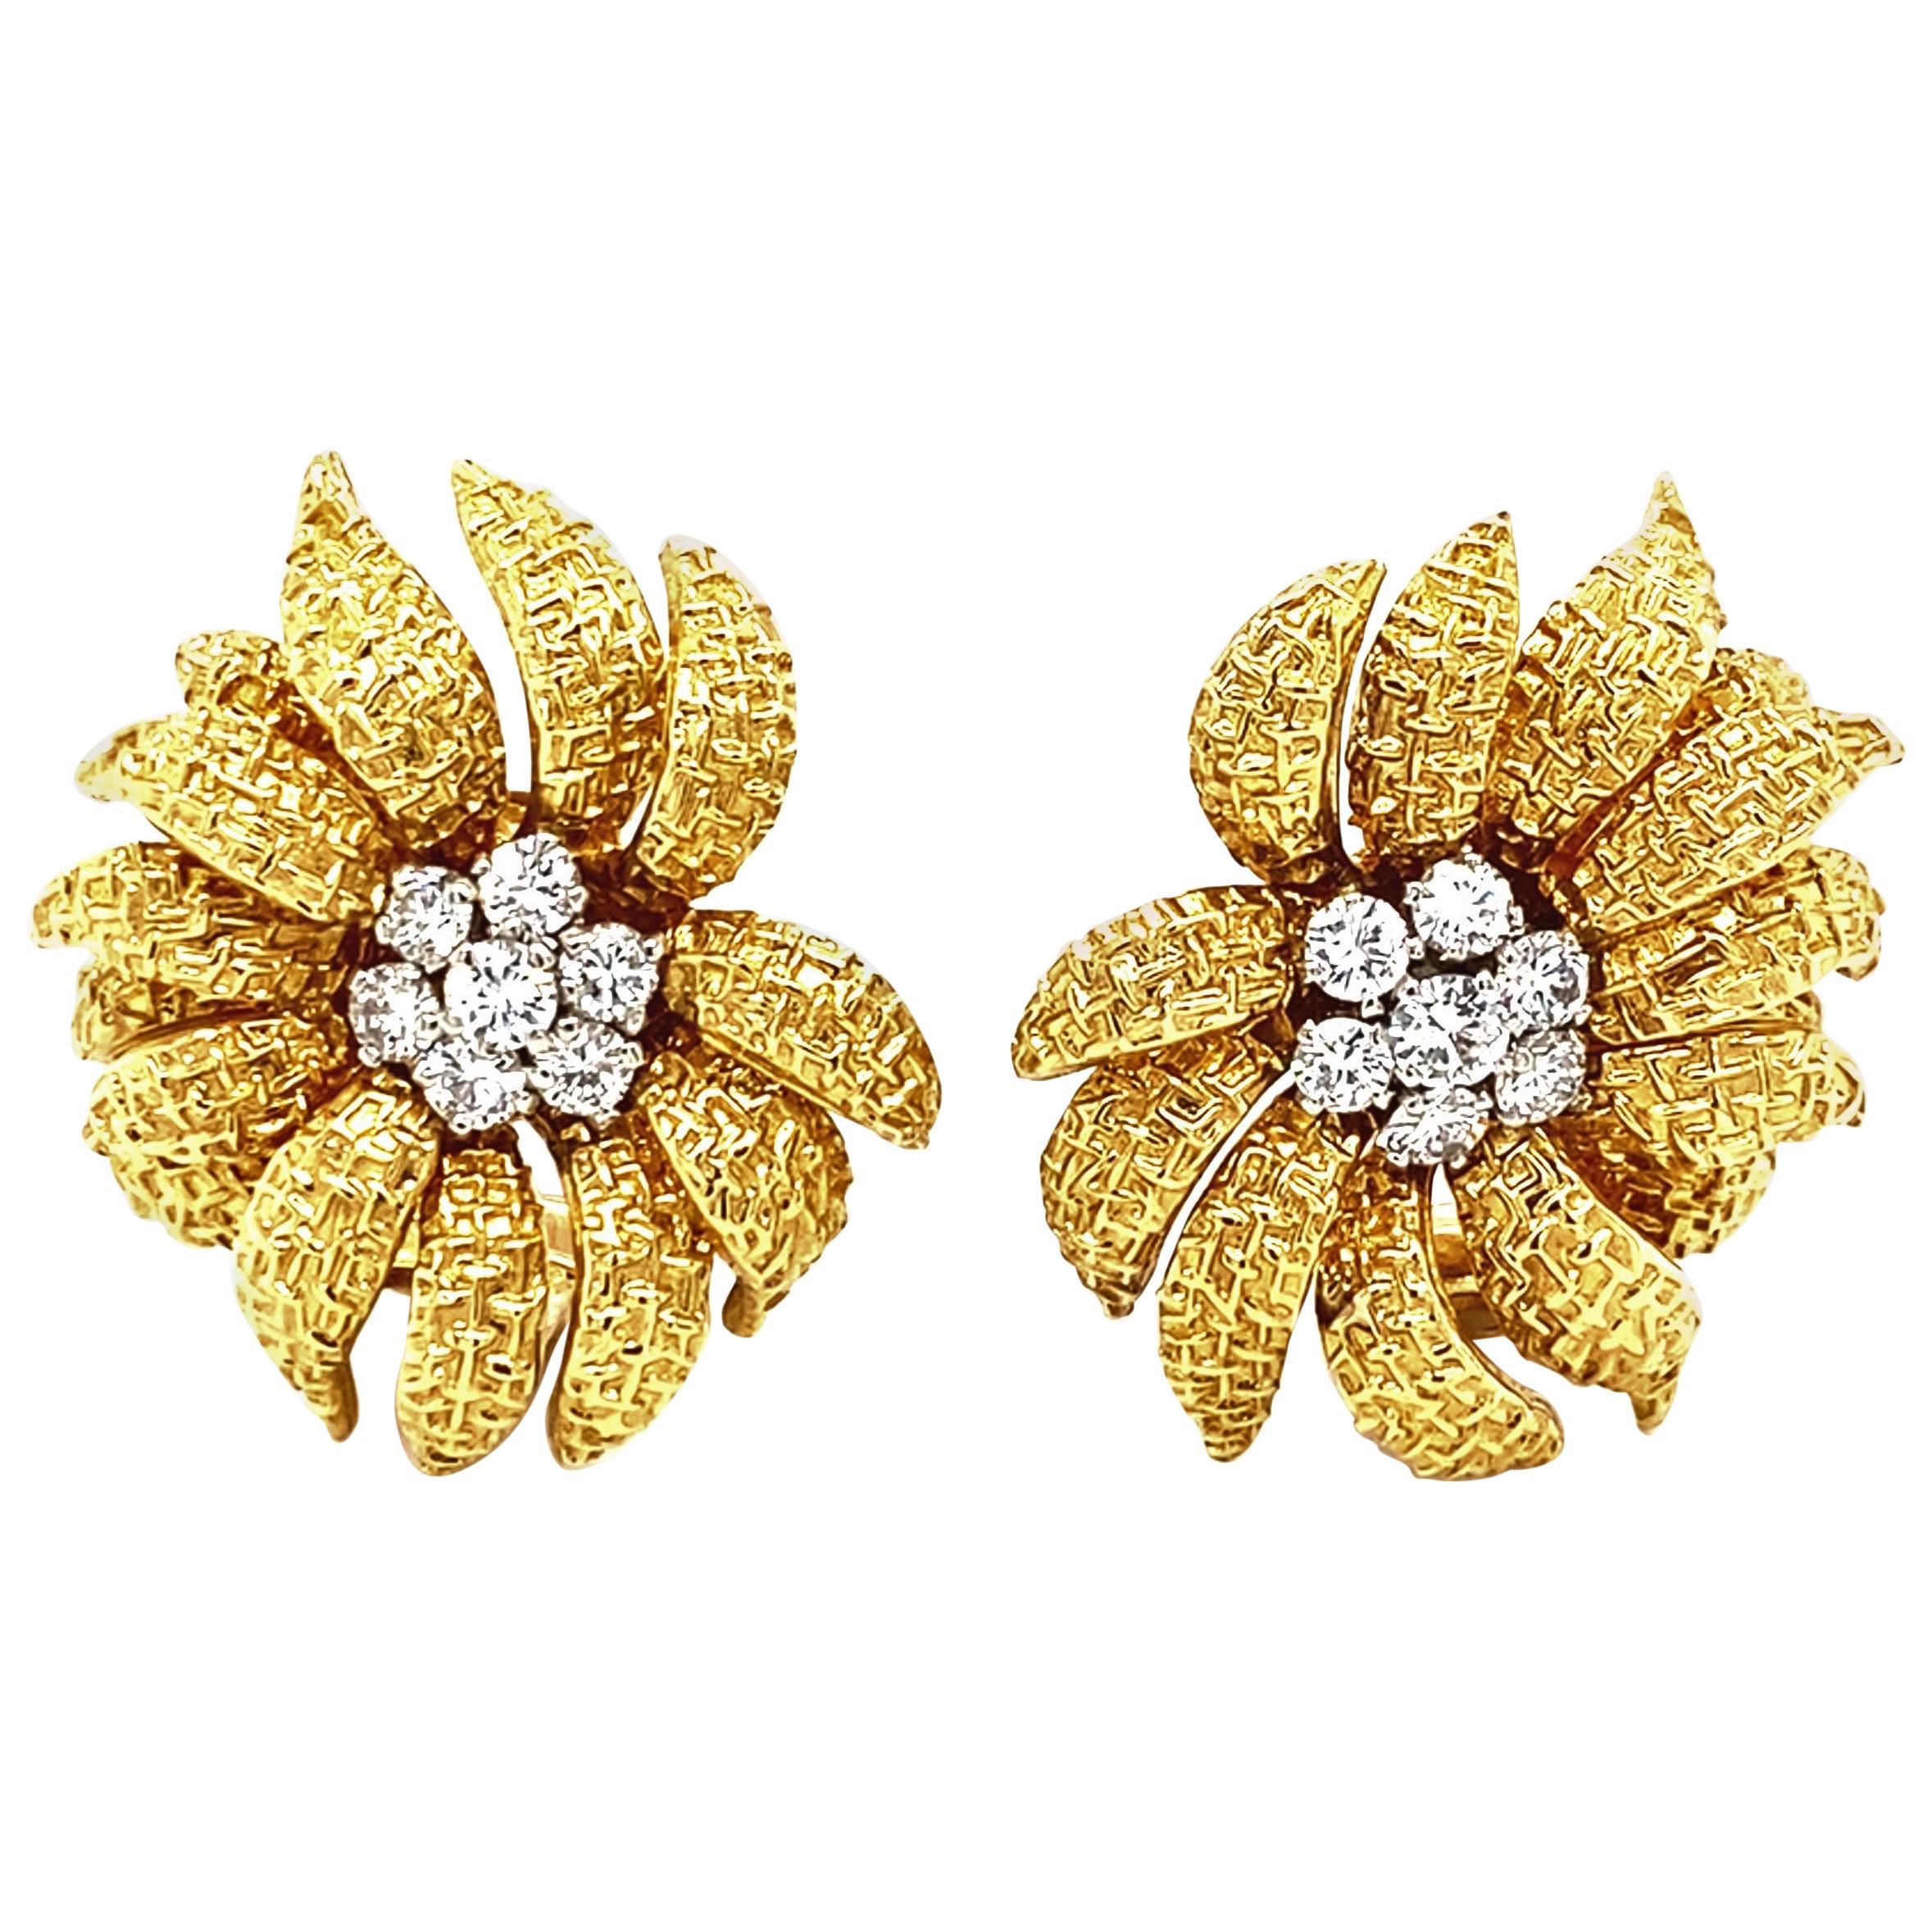 Van Cleef & Arpels 18 Karat Gold and Diamond Ear Clips, 1960s